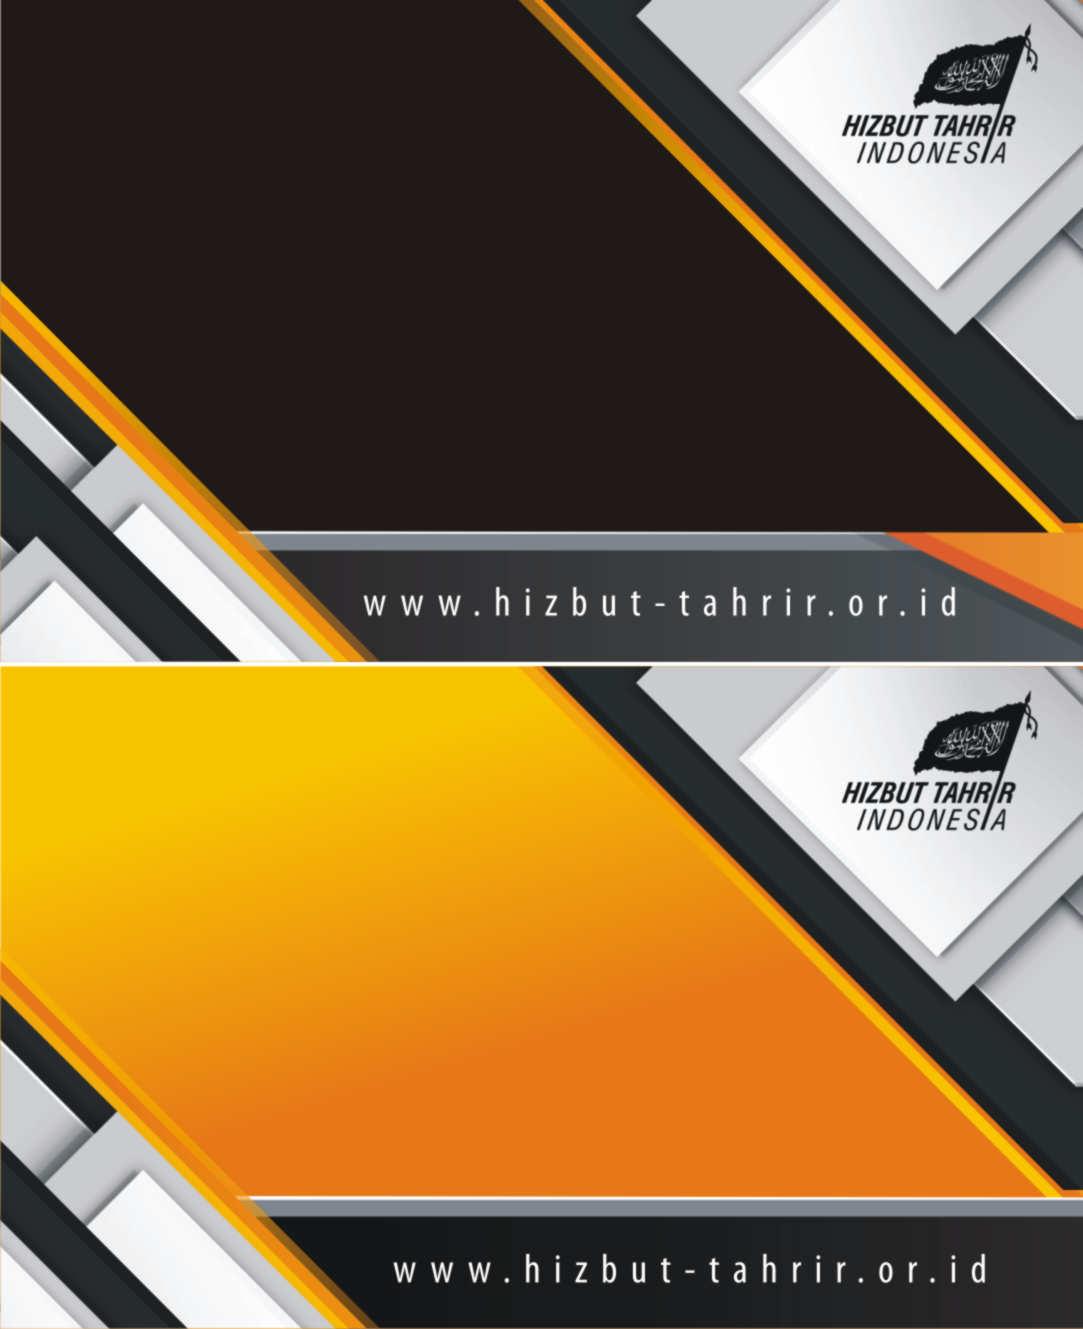 Template Kartu Nama Free Download Wallpaper Ideologis